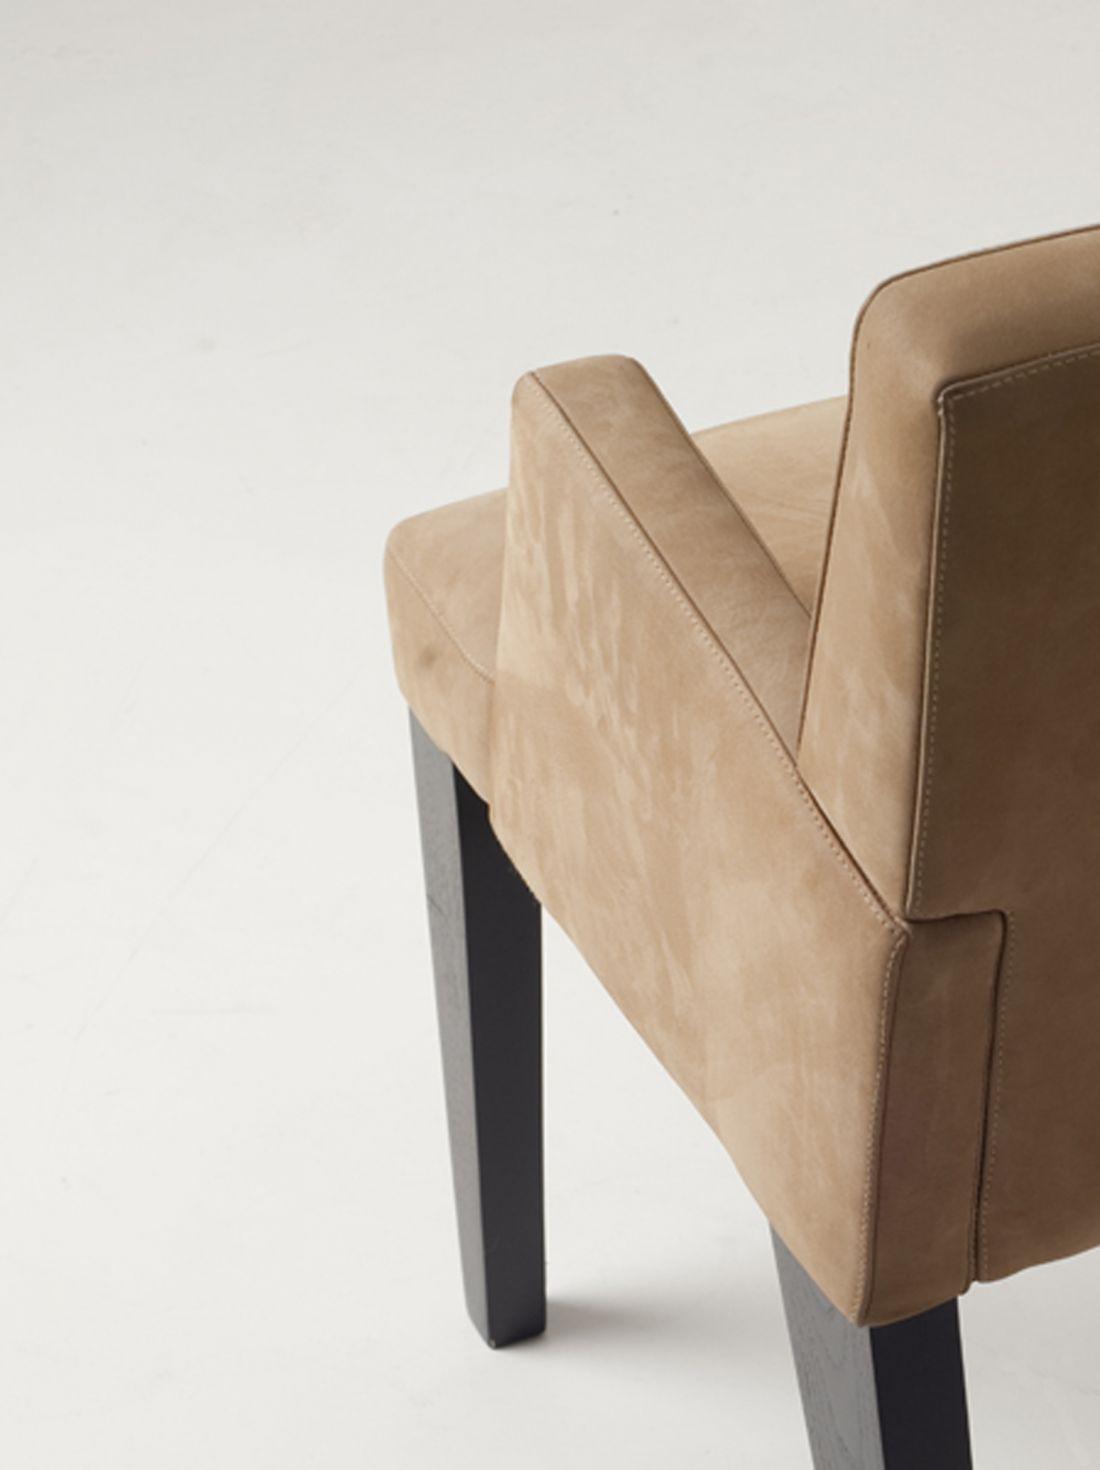 jf-dor-loudordesign-interni-chair-brussels-2